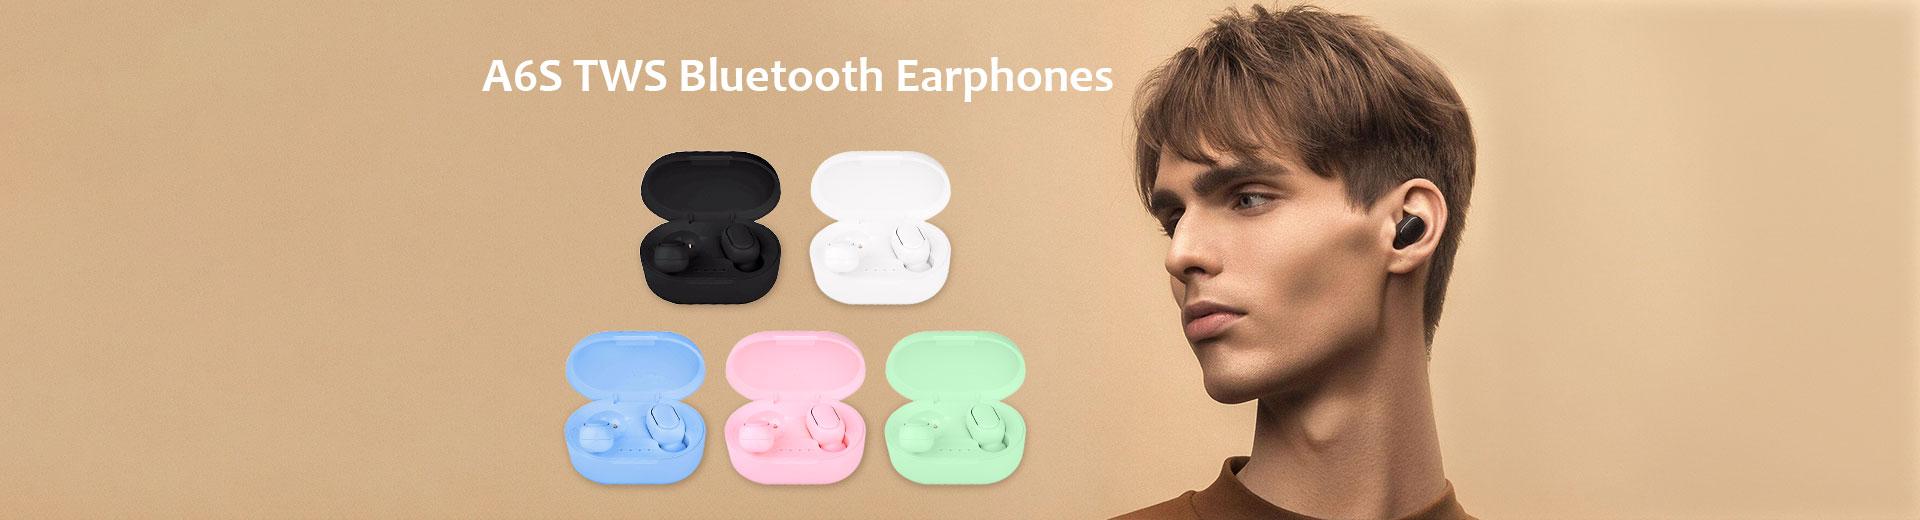 A6S TWS Bluetooth Earphones